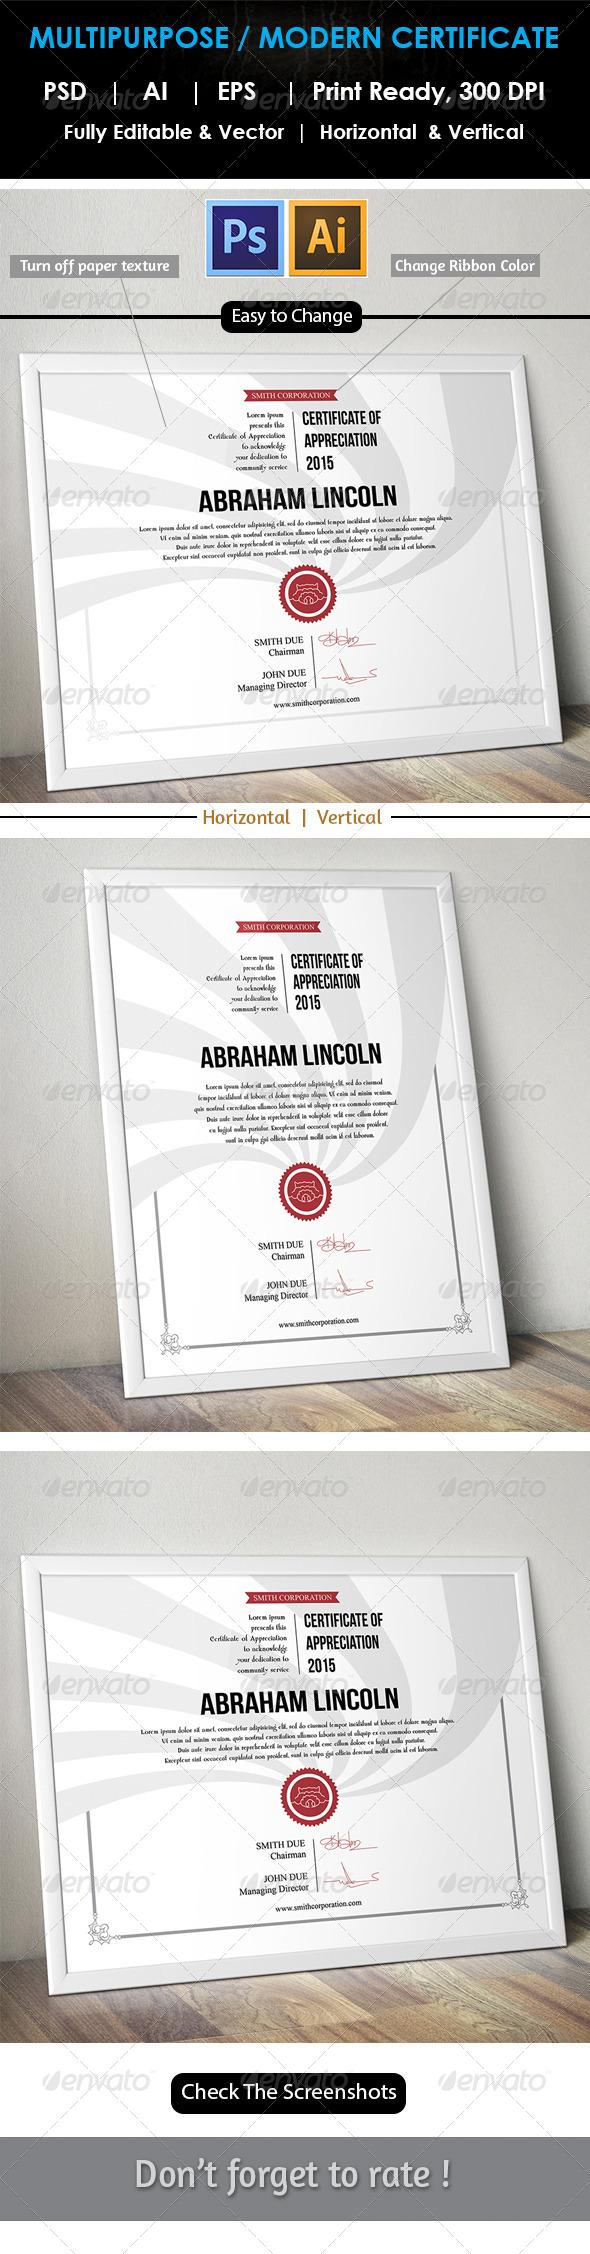 Easy Simple Multipurpose Certificate GD007 | Pinterest | Urkunde